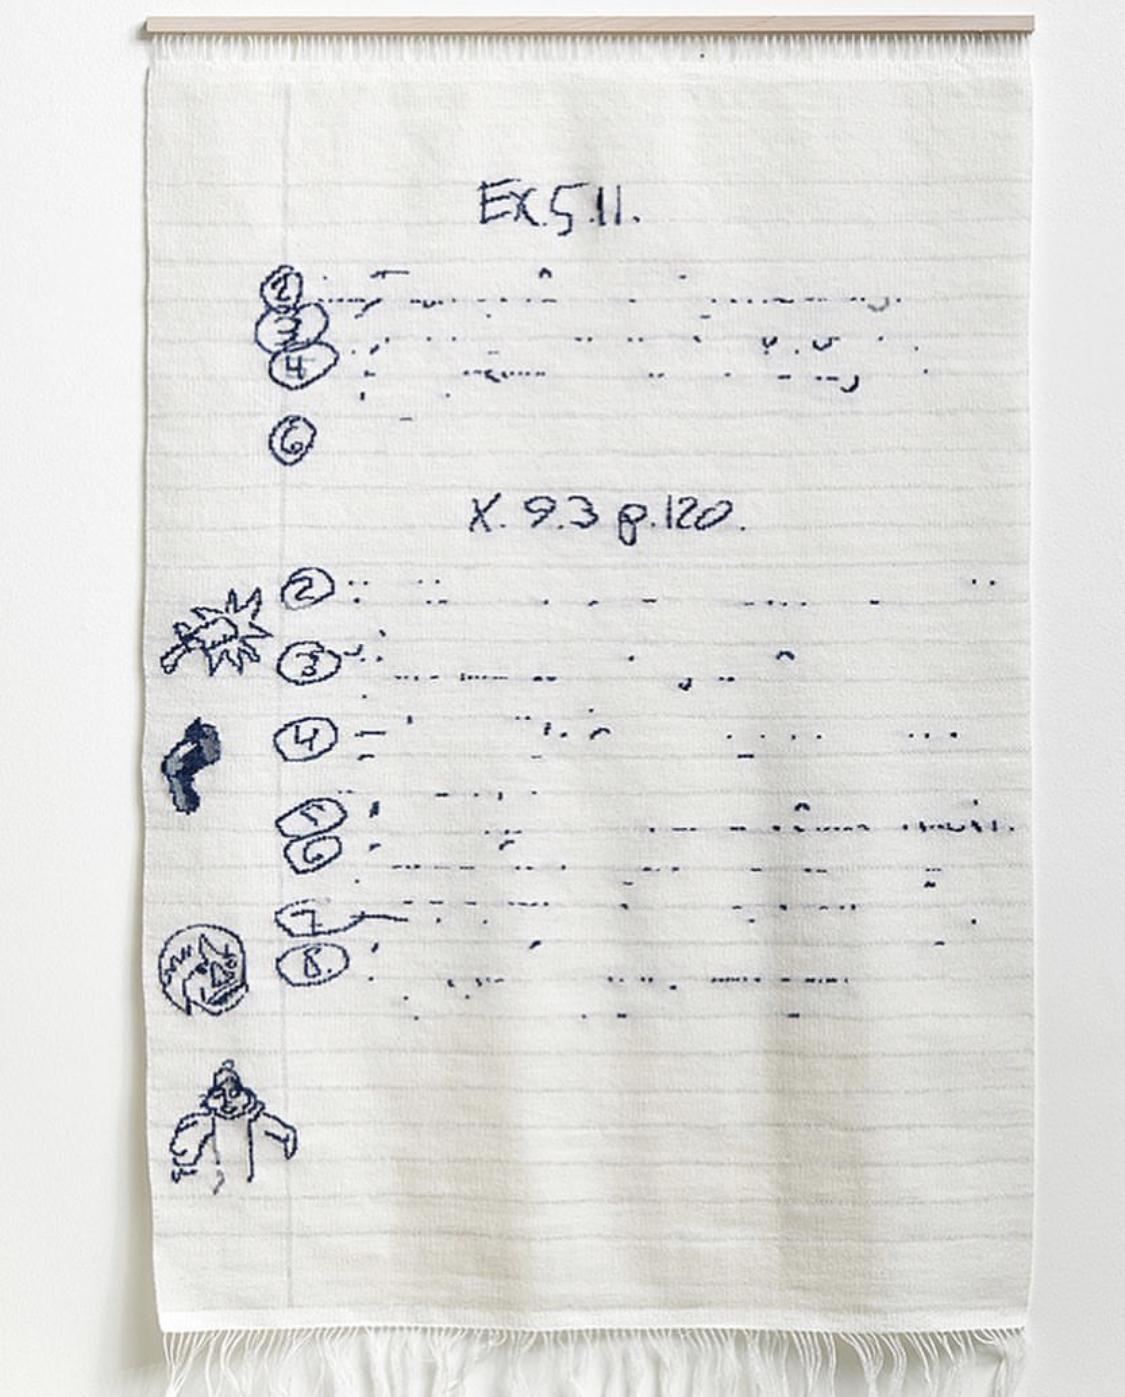 Woven Doodle Page by Arna Ottarsdottir